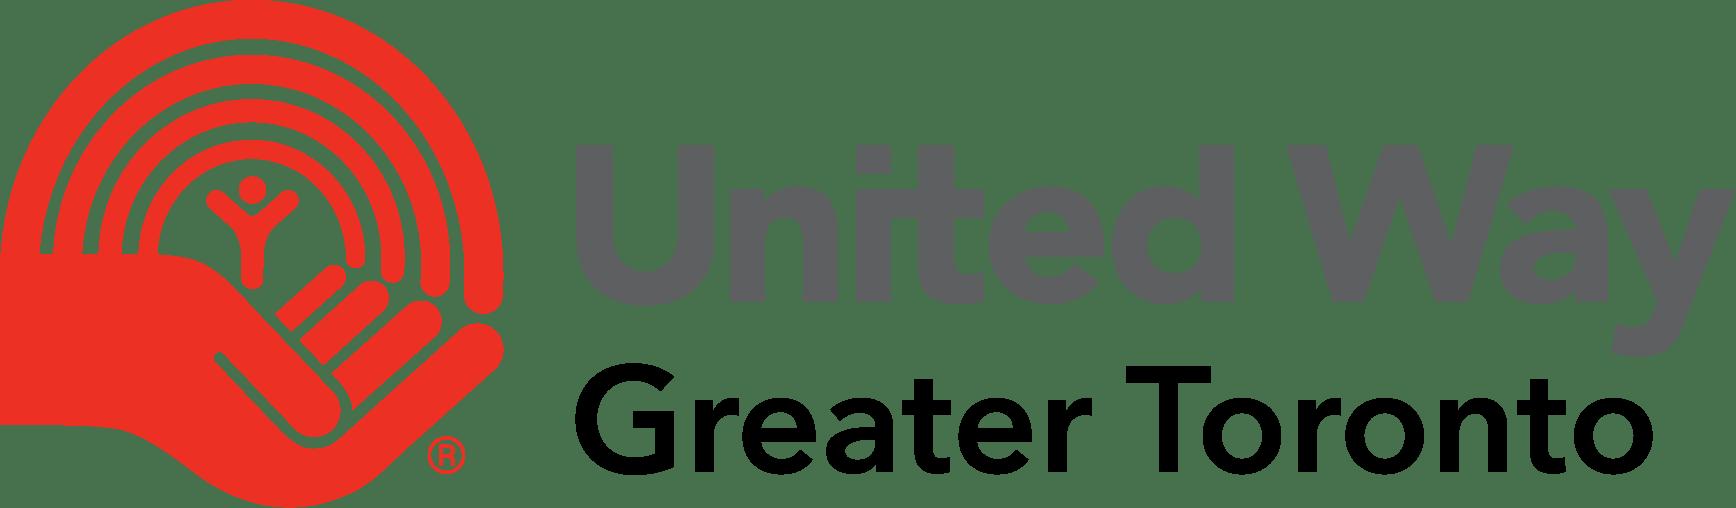 United-Way-Of-Greater-Toronto-Logo-Horizontal